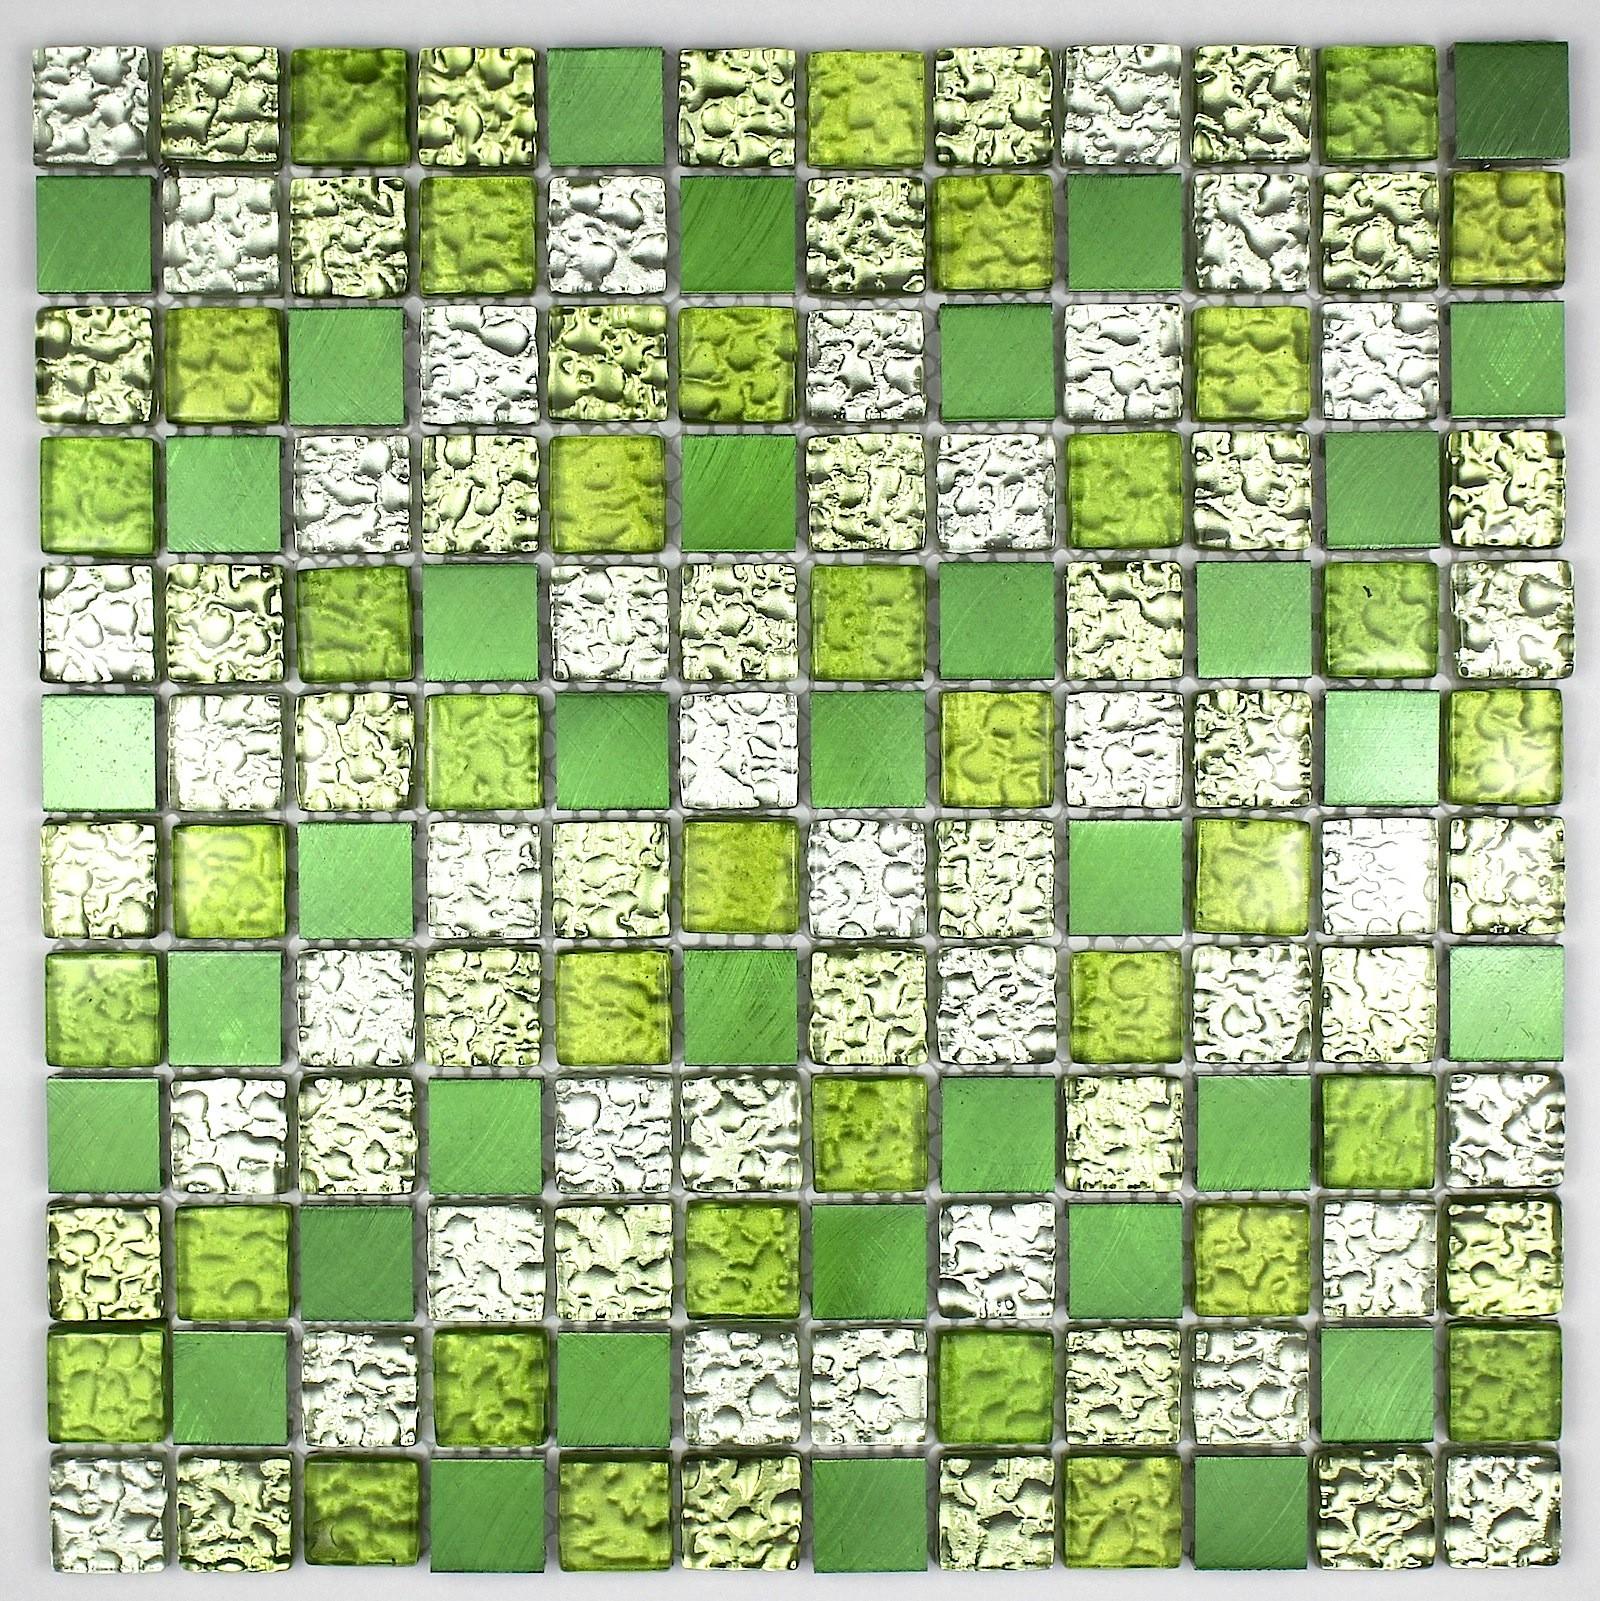 mosaique verte salle de bain. idee deco salle de bain gris et vert